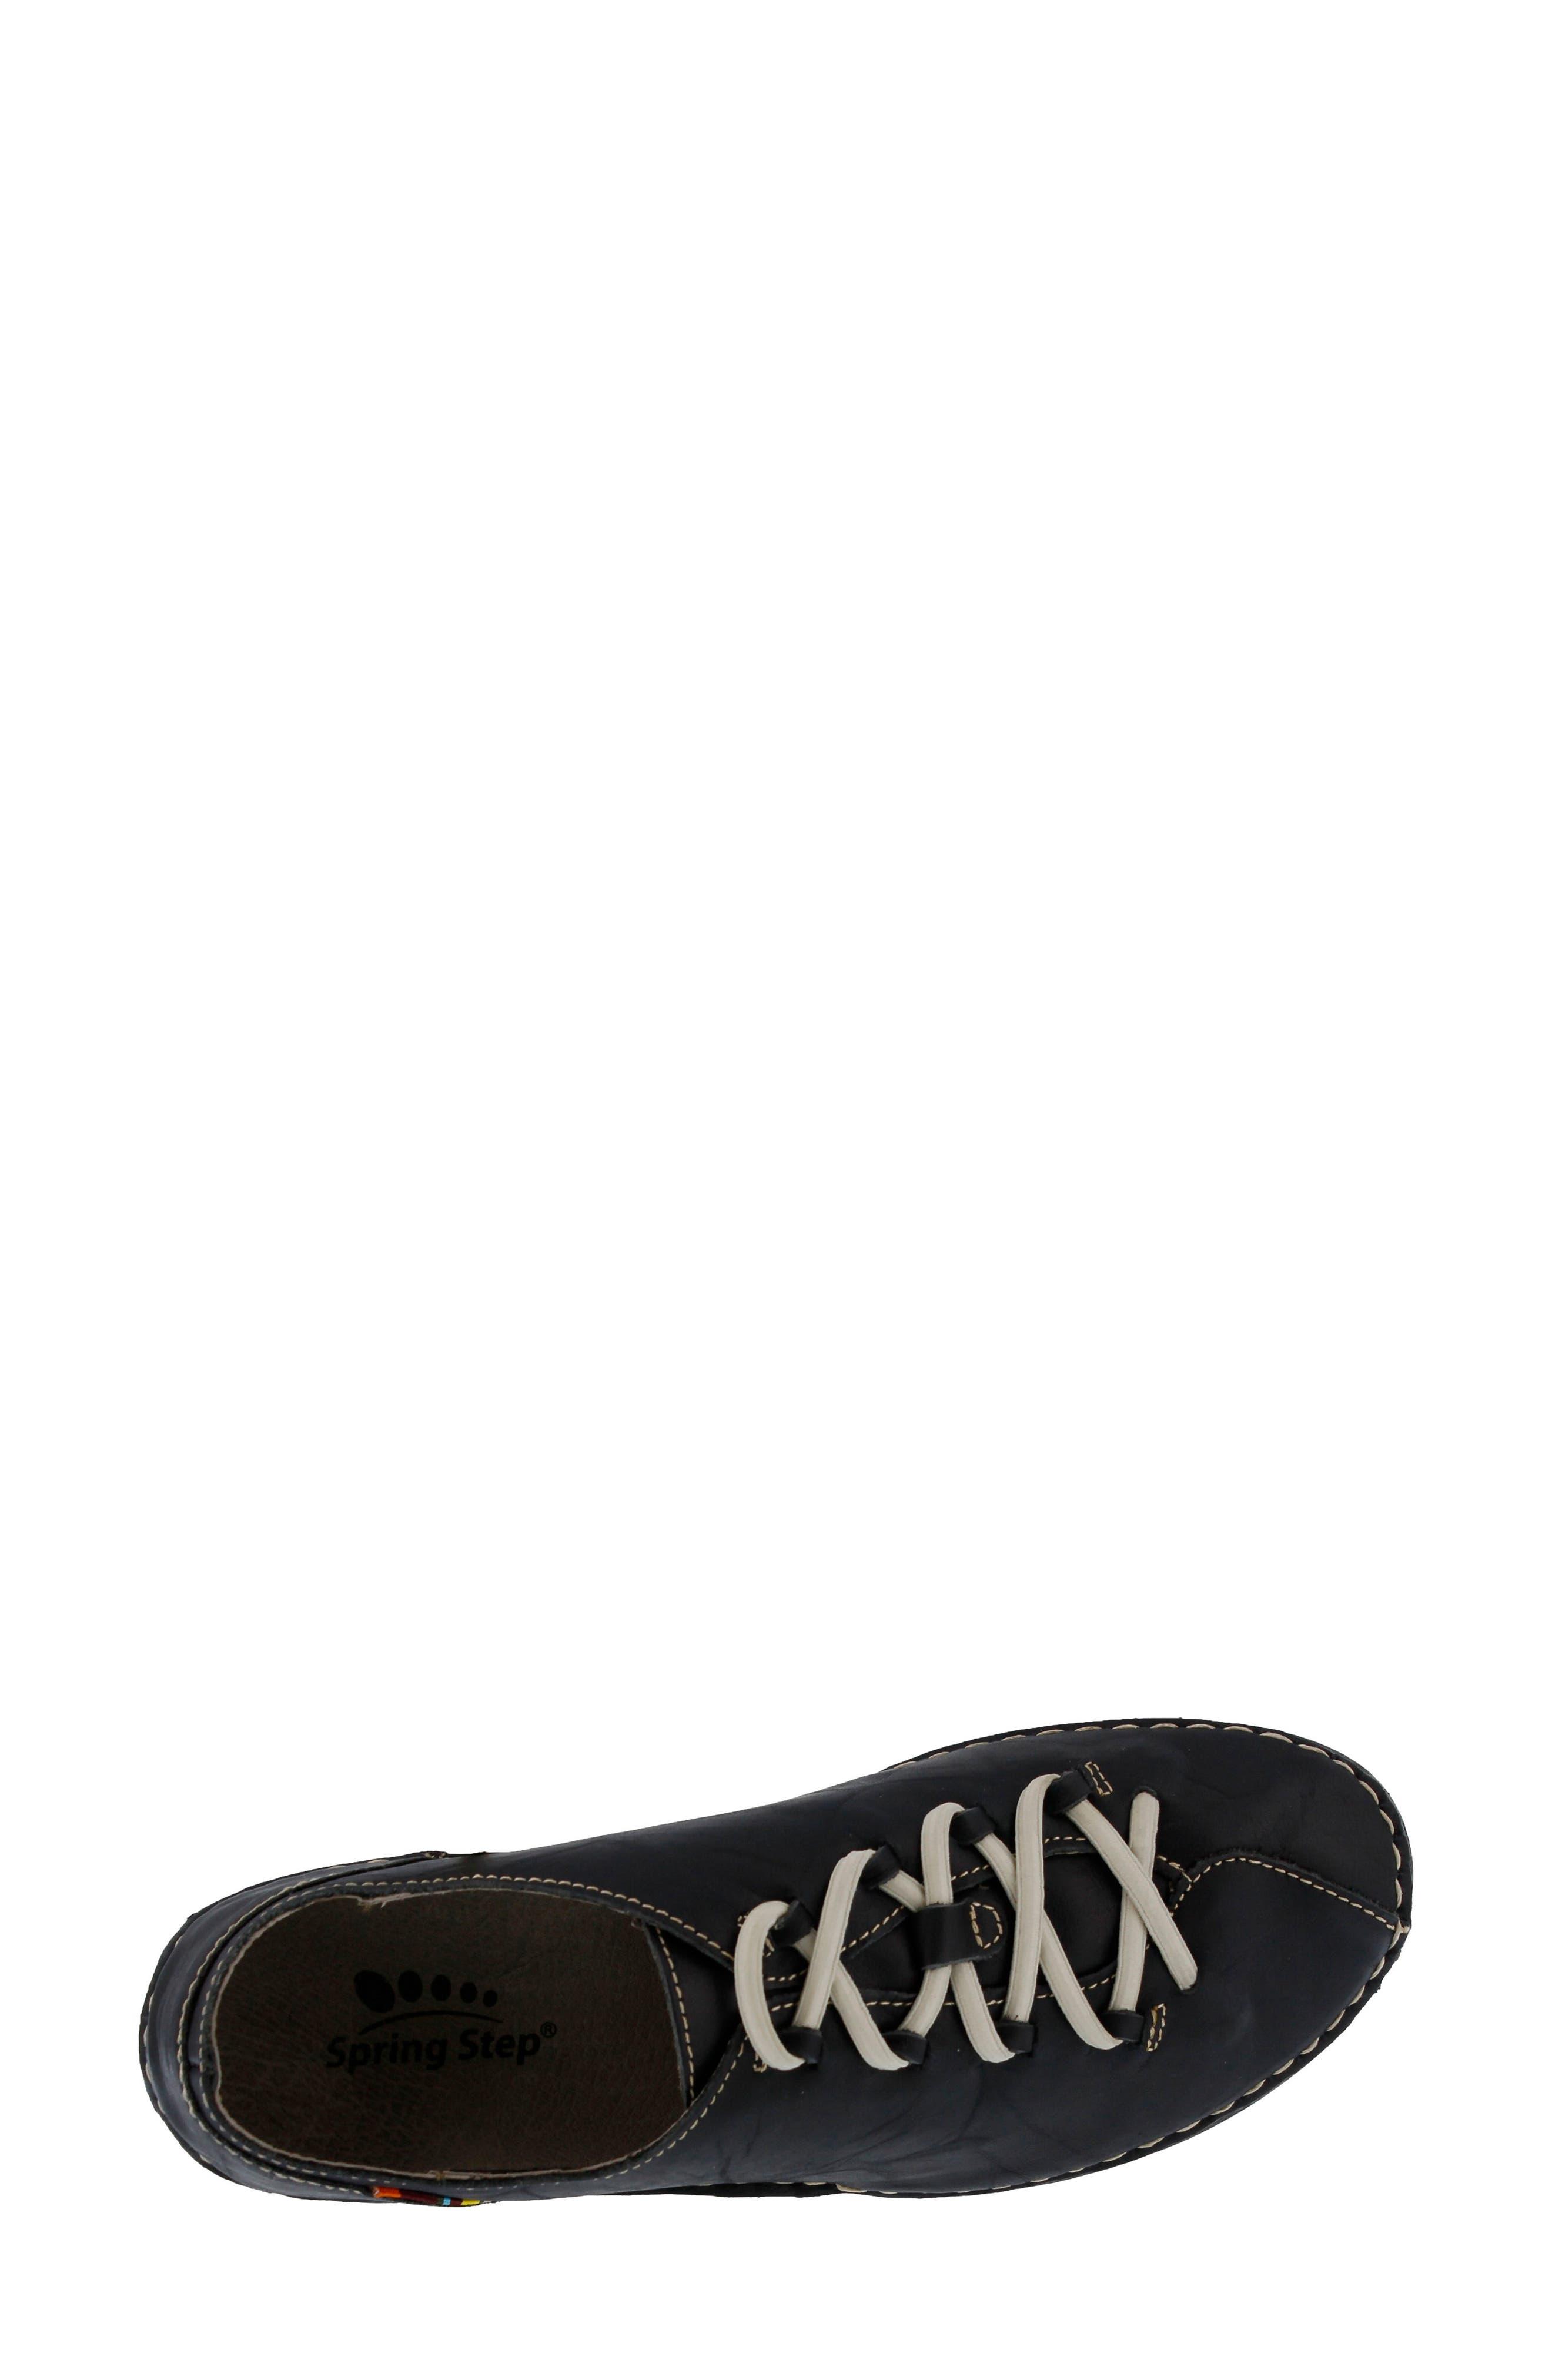 Carhop Sneaker,                             Alternate thumbnail 4, color,                             BLACK LEATHER